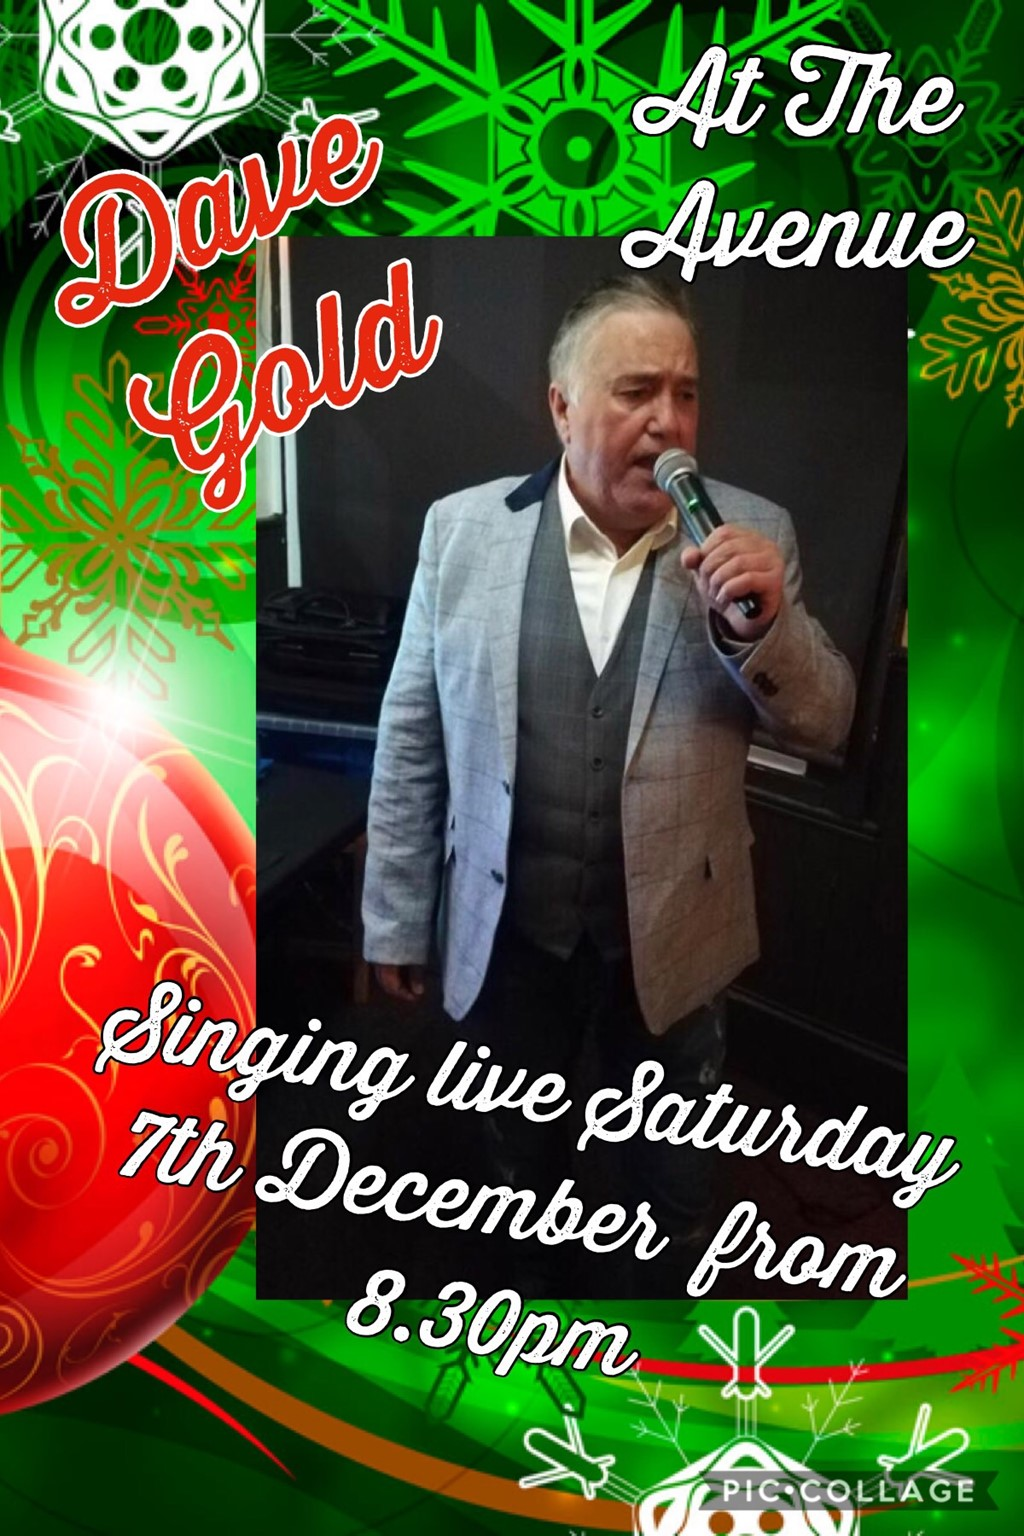 Dave Gold singing live!